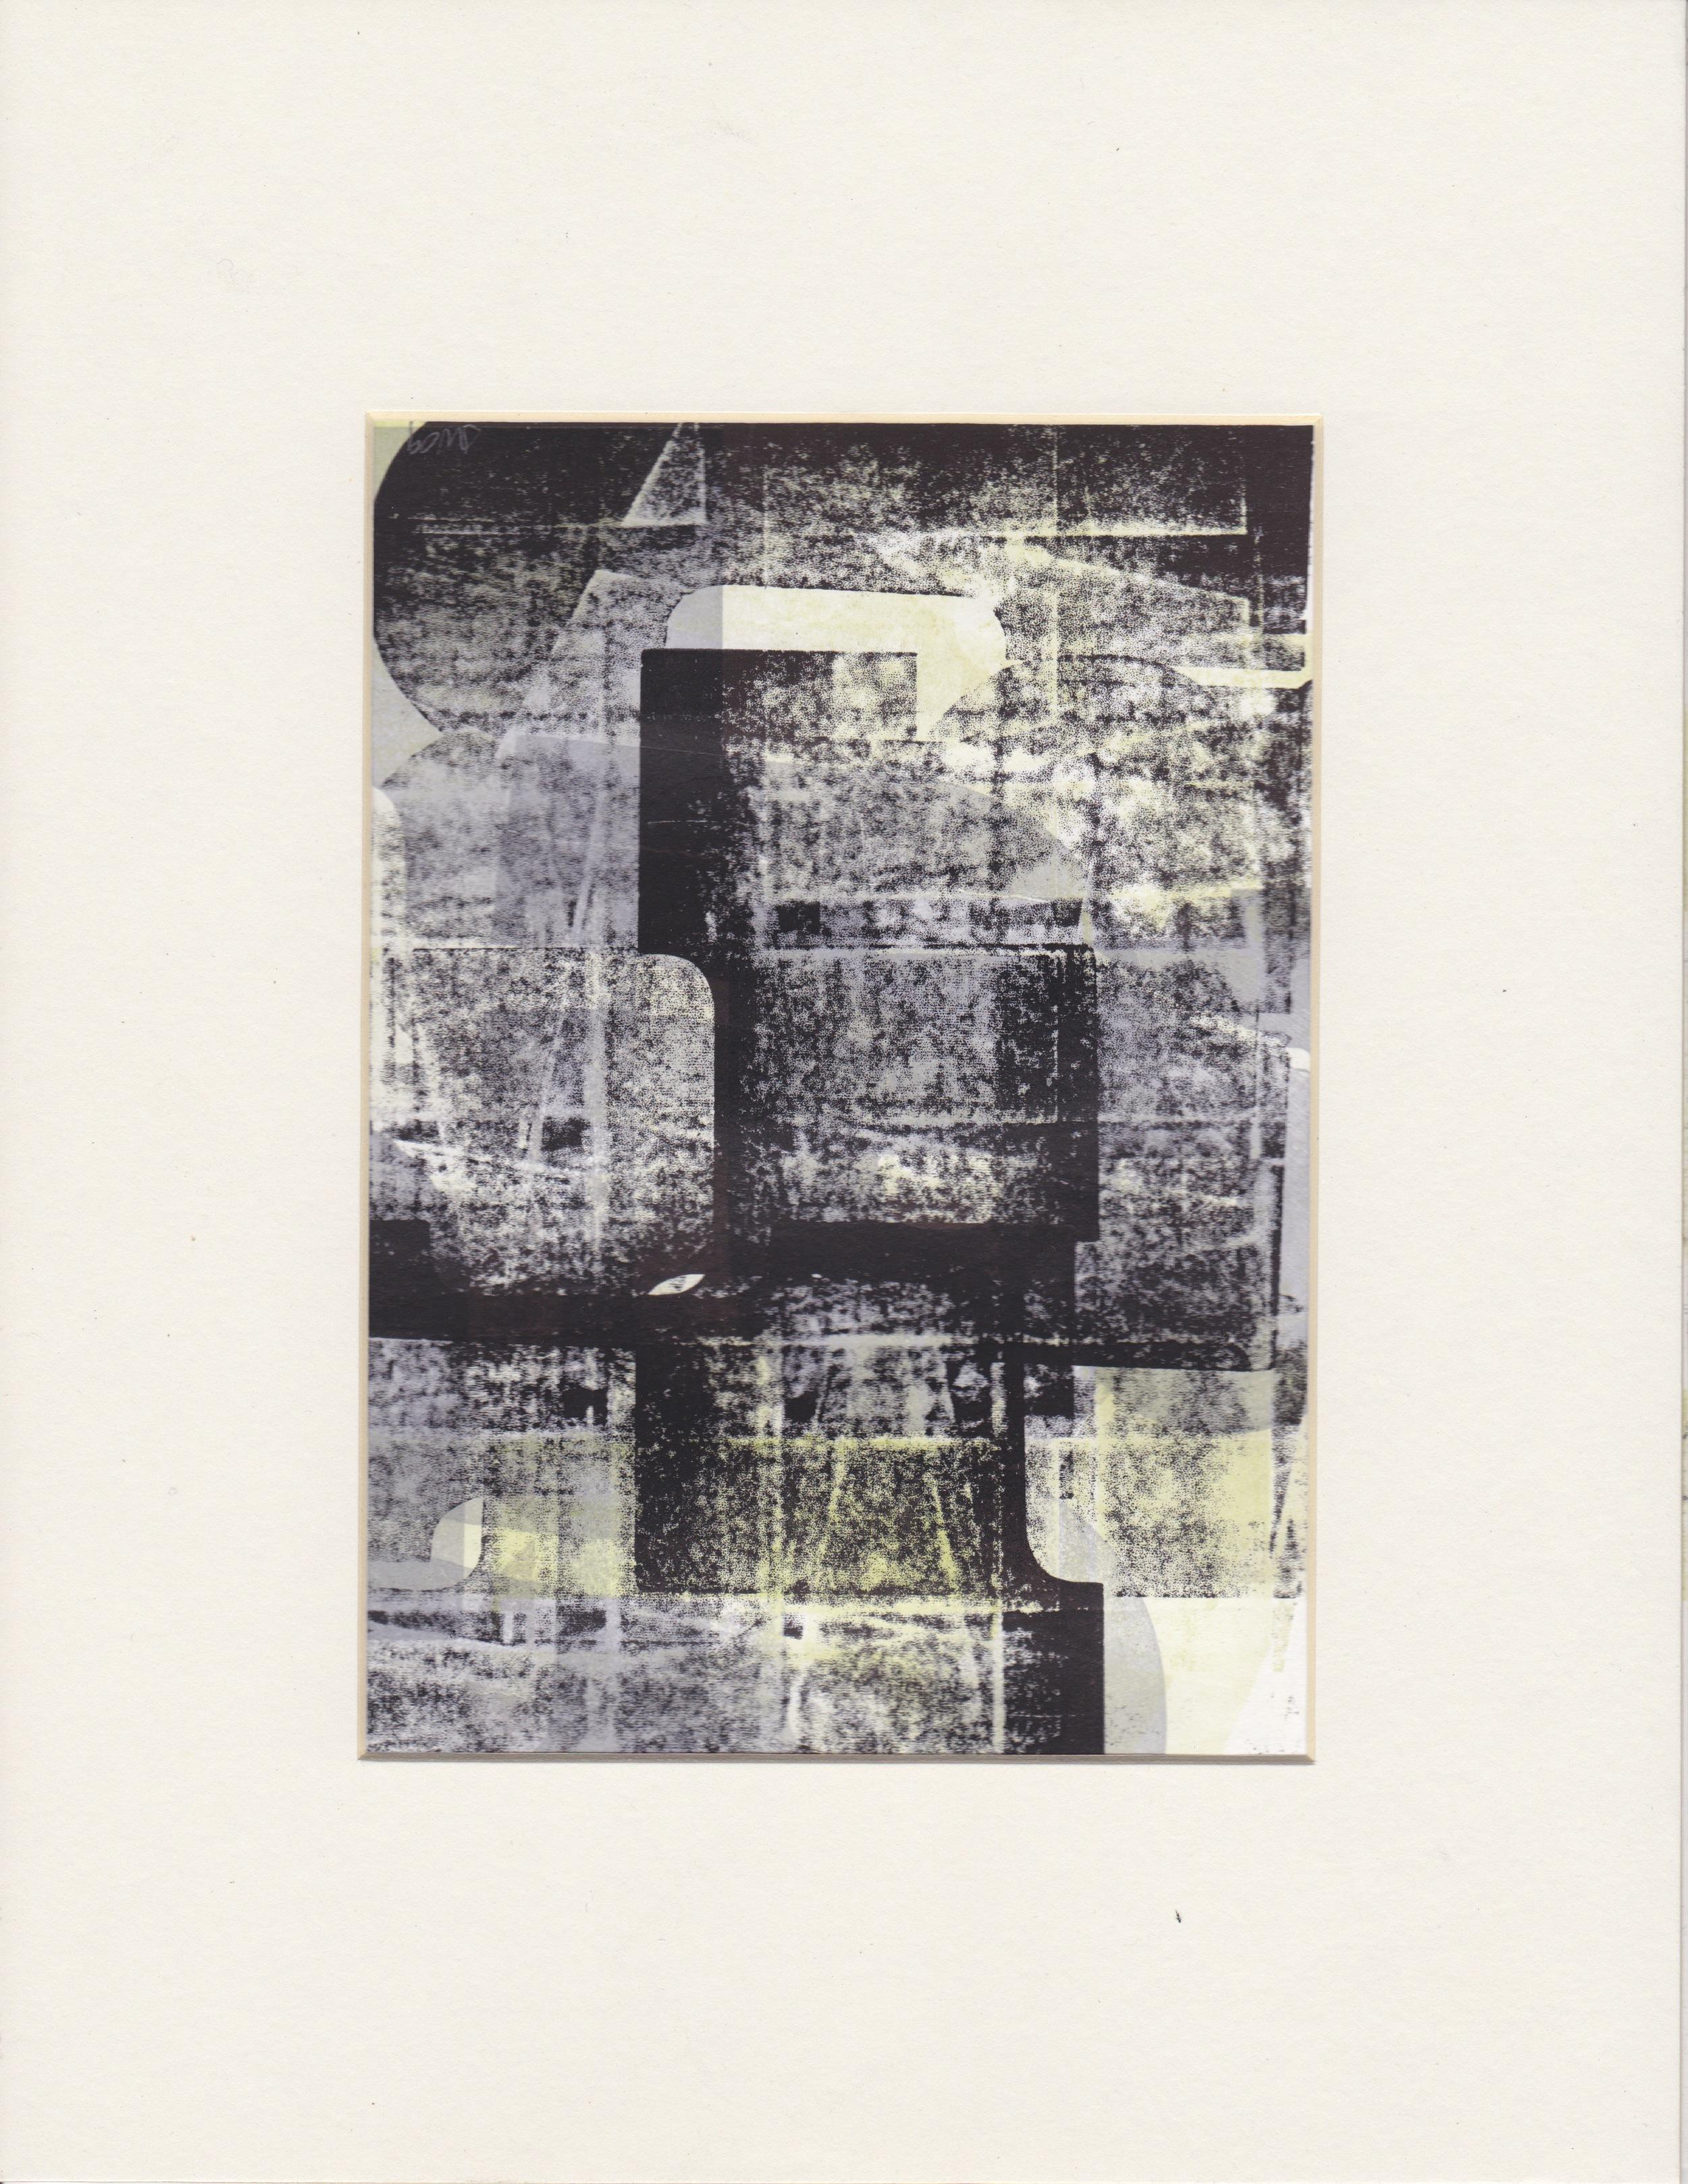 Woodtype Monotype 15